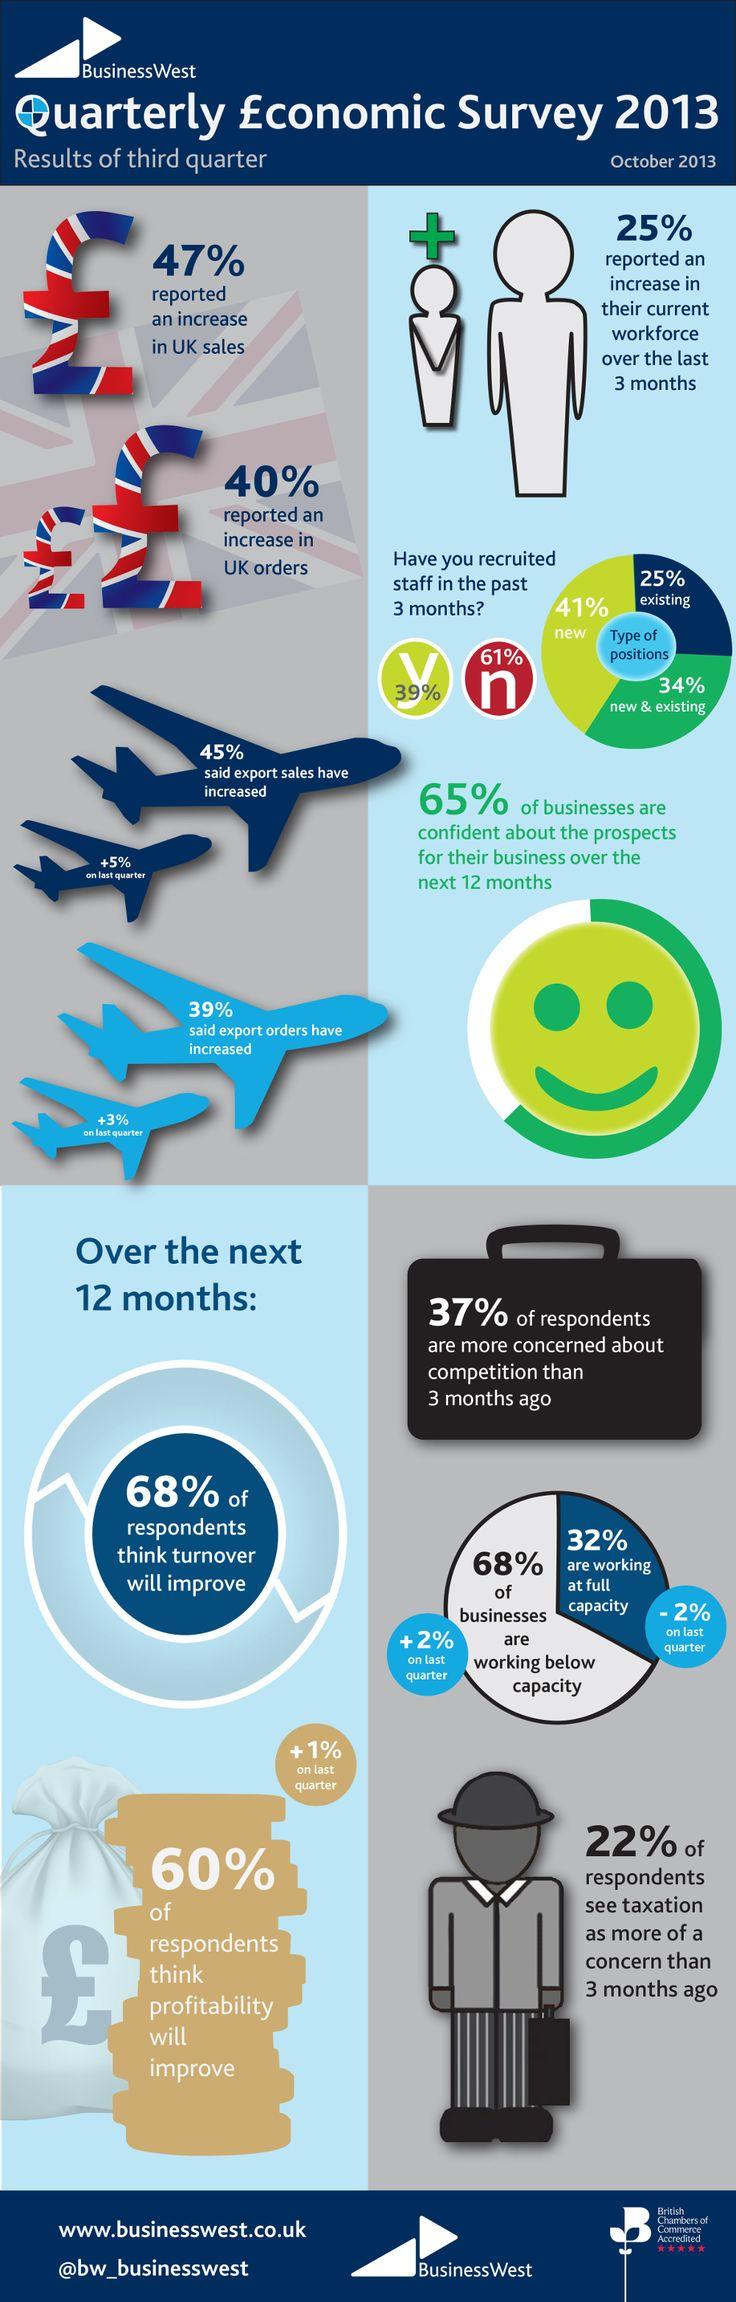 survey results infographic Surveys, Infographic